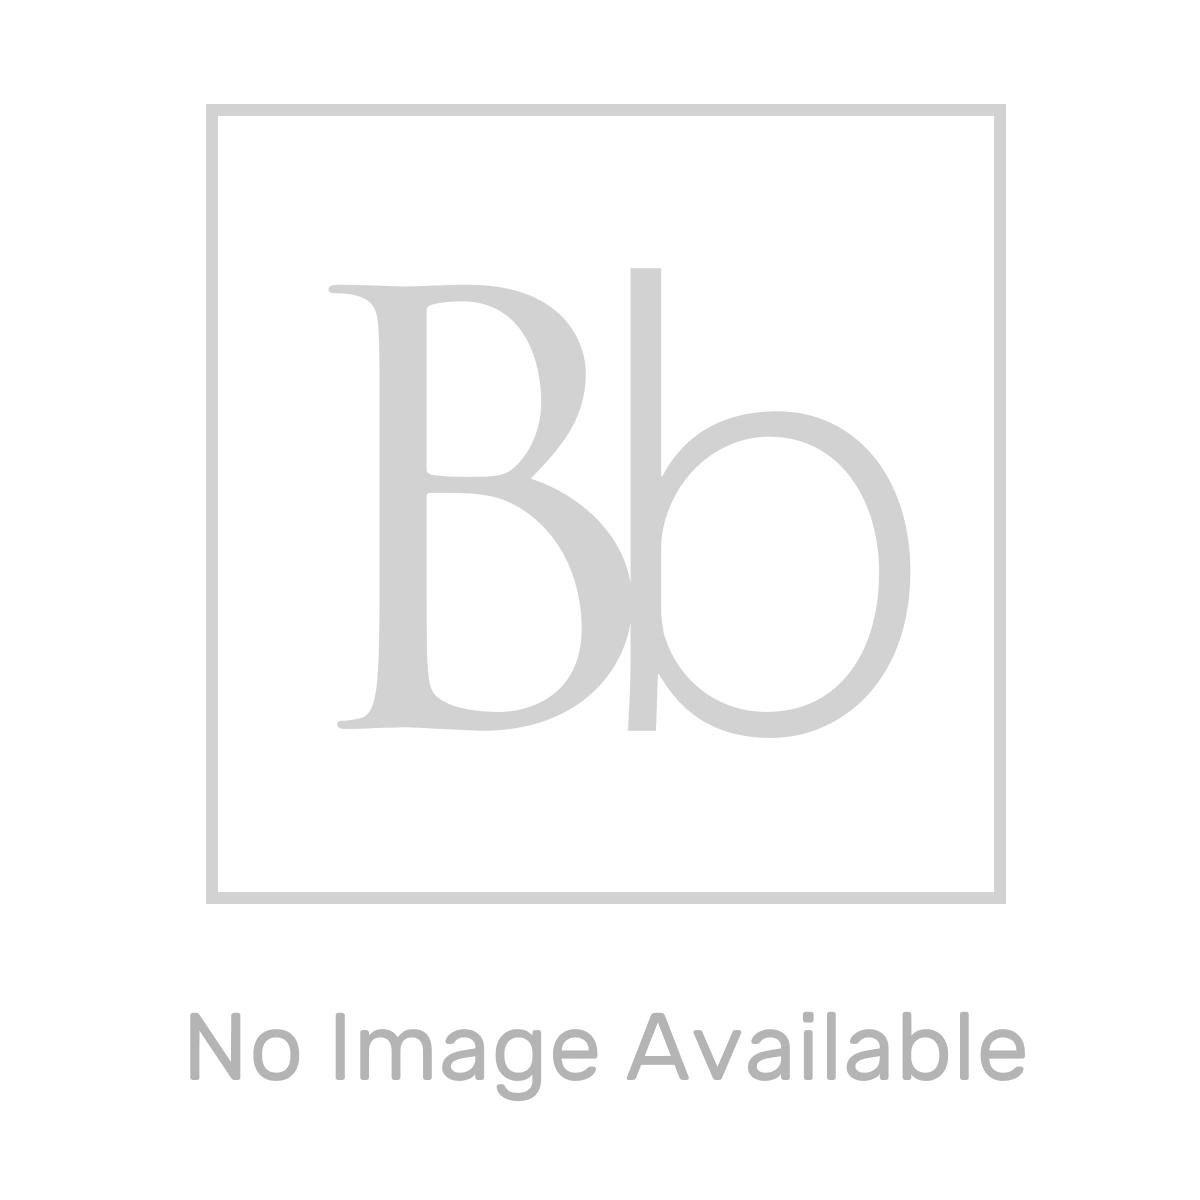 Frontline Super Strength White Bath Front Panel 1700mm